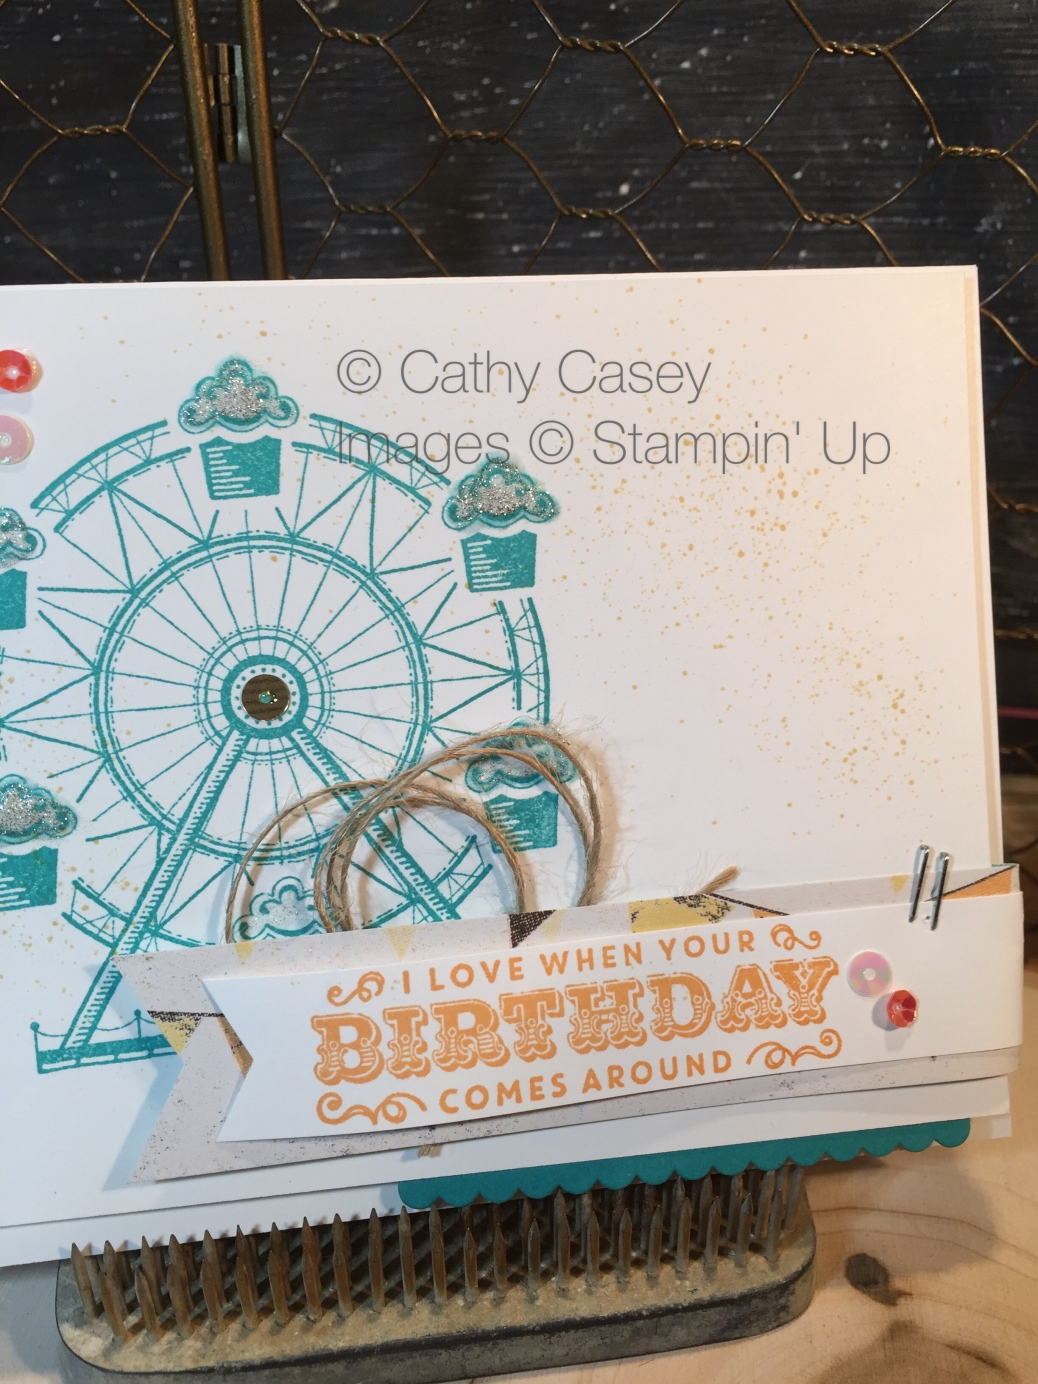 Carousel Birthday Stampin' Up